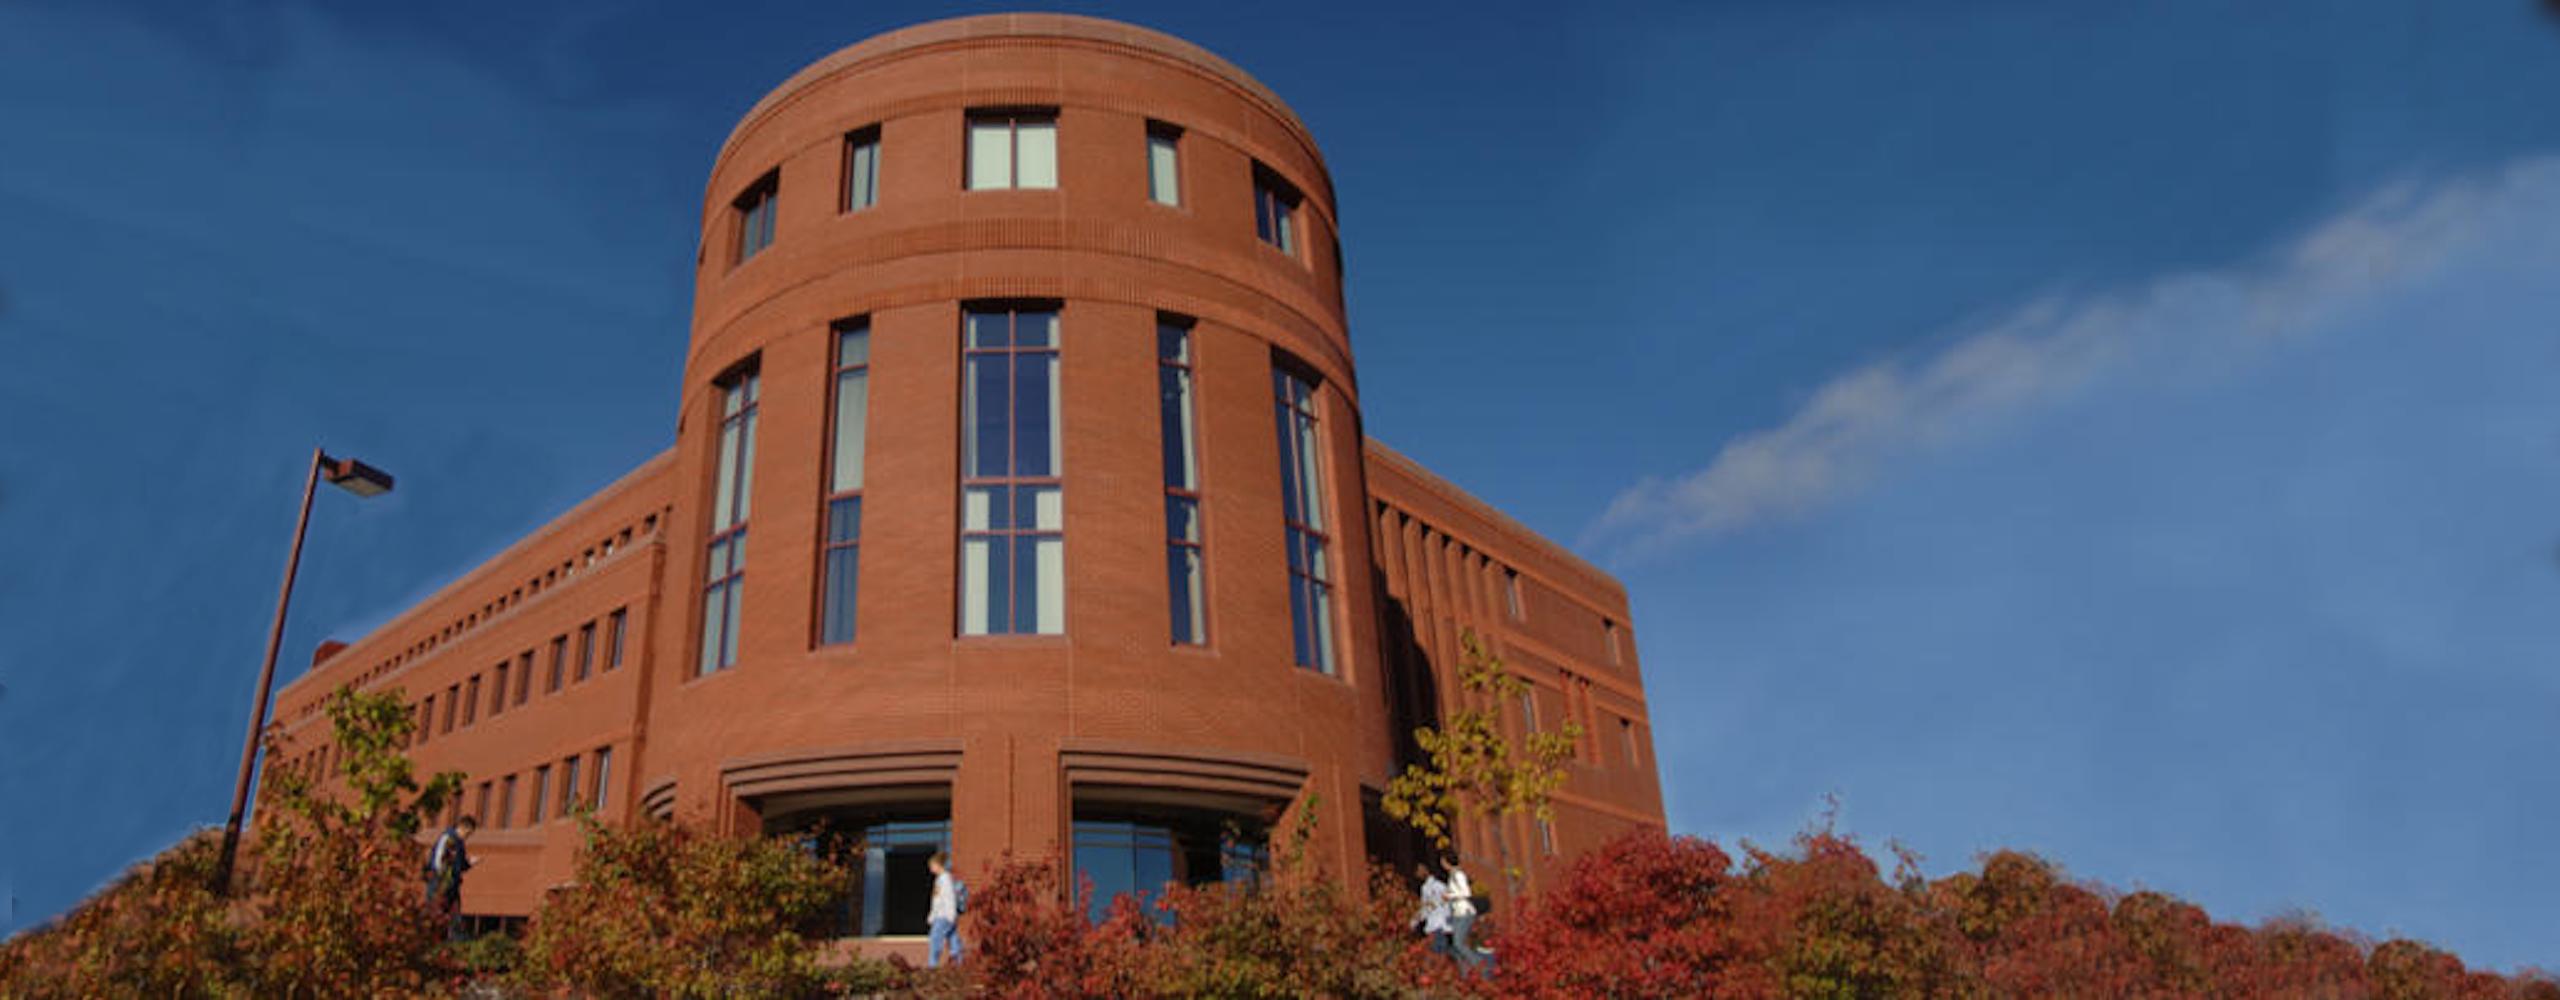 UMD KAM Library